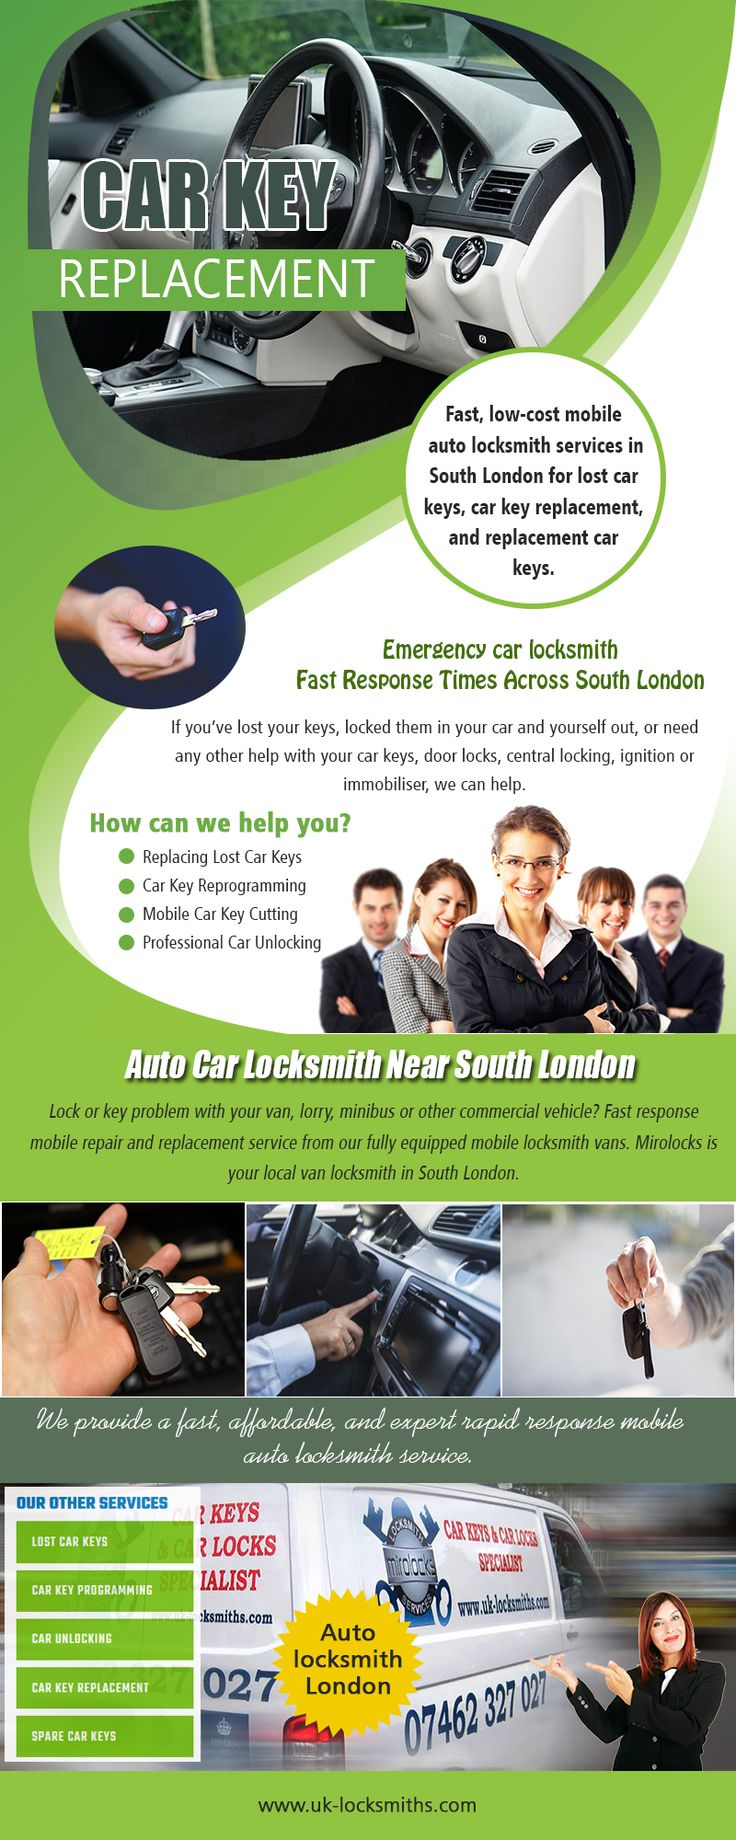 Car Key Replacement Near Me Call 07462 327 027 uk